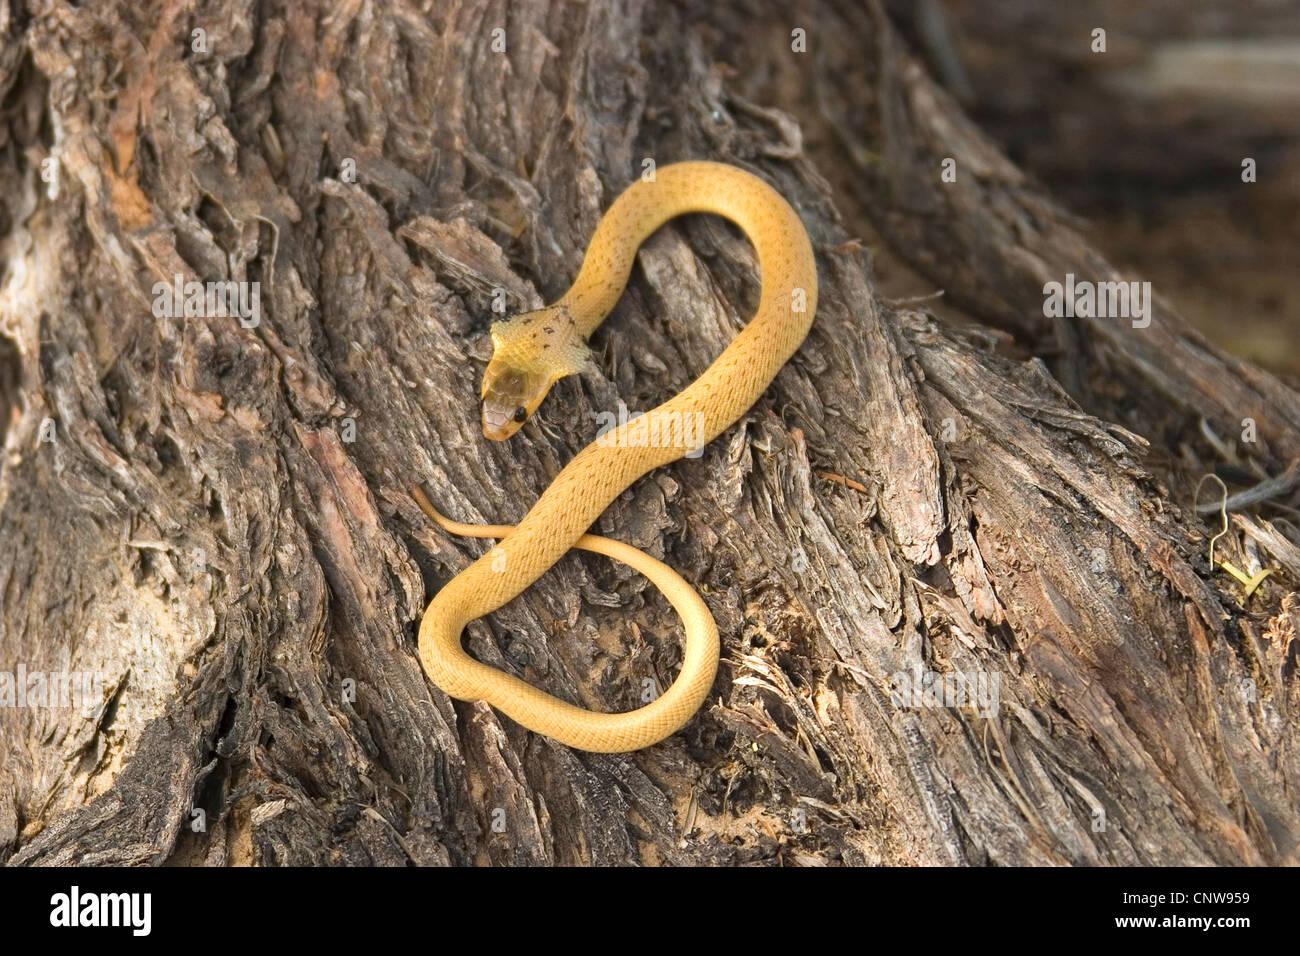 Cape cobra, yellow cobra (Naja nivea), juvenile in defence posture, South Africa, Kalahari Gemsbok National Park - Stock Image